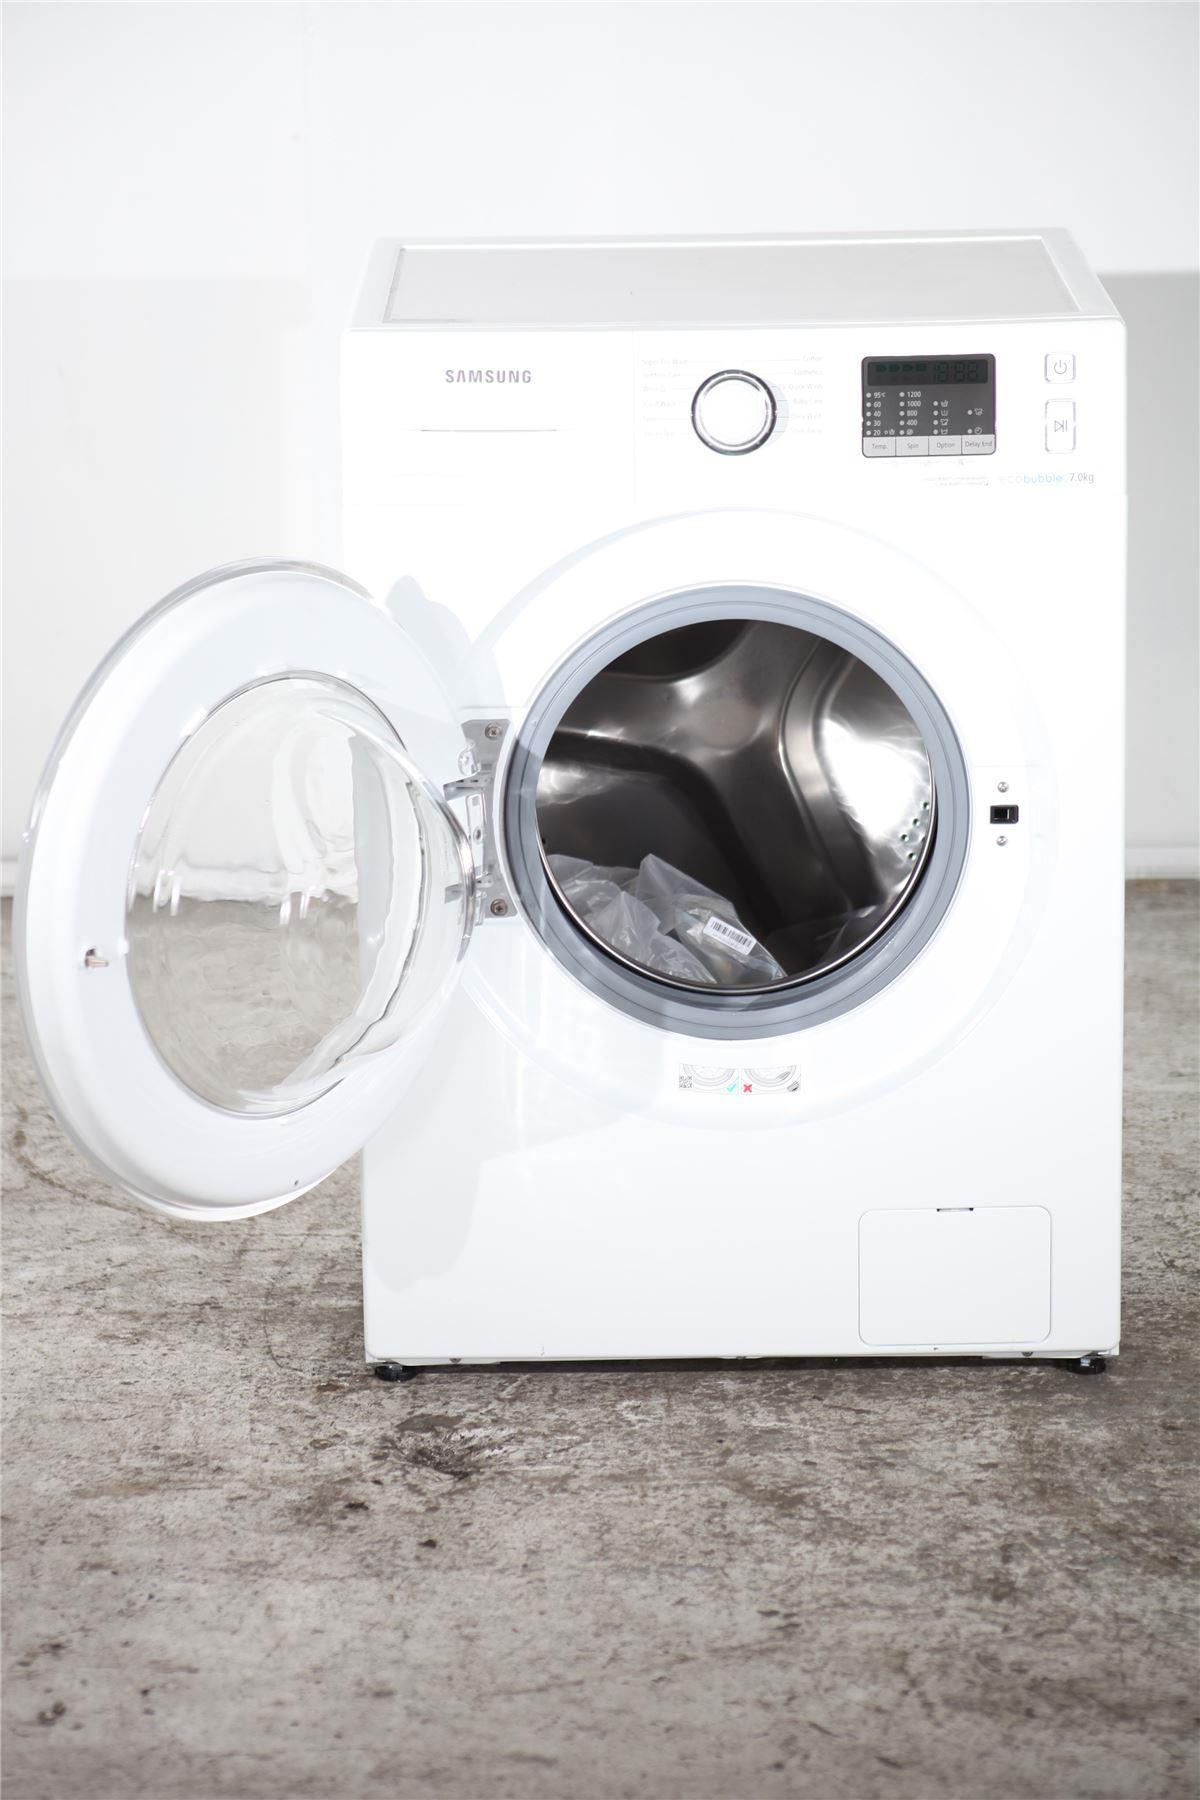 Samsung 7kg Washing Machine Eco Bubble Wf70f5e2w2w